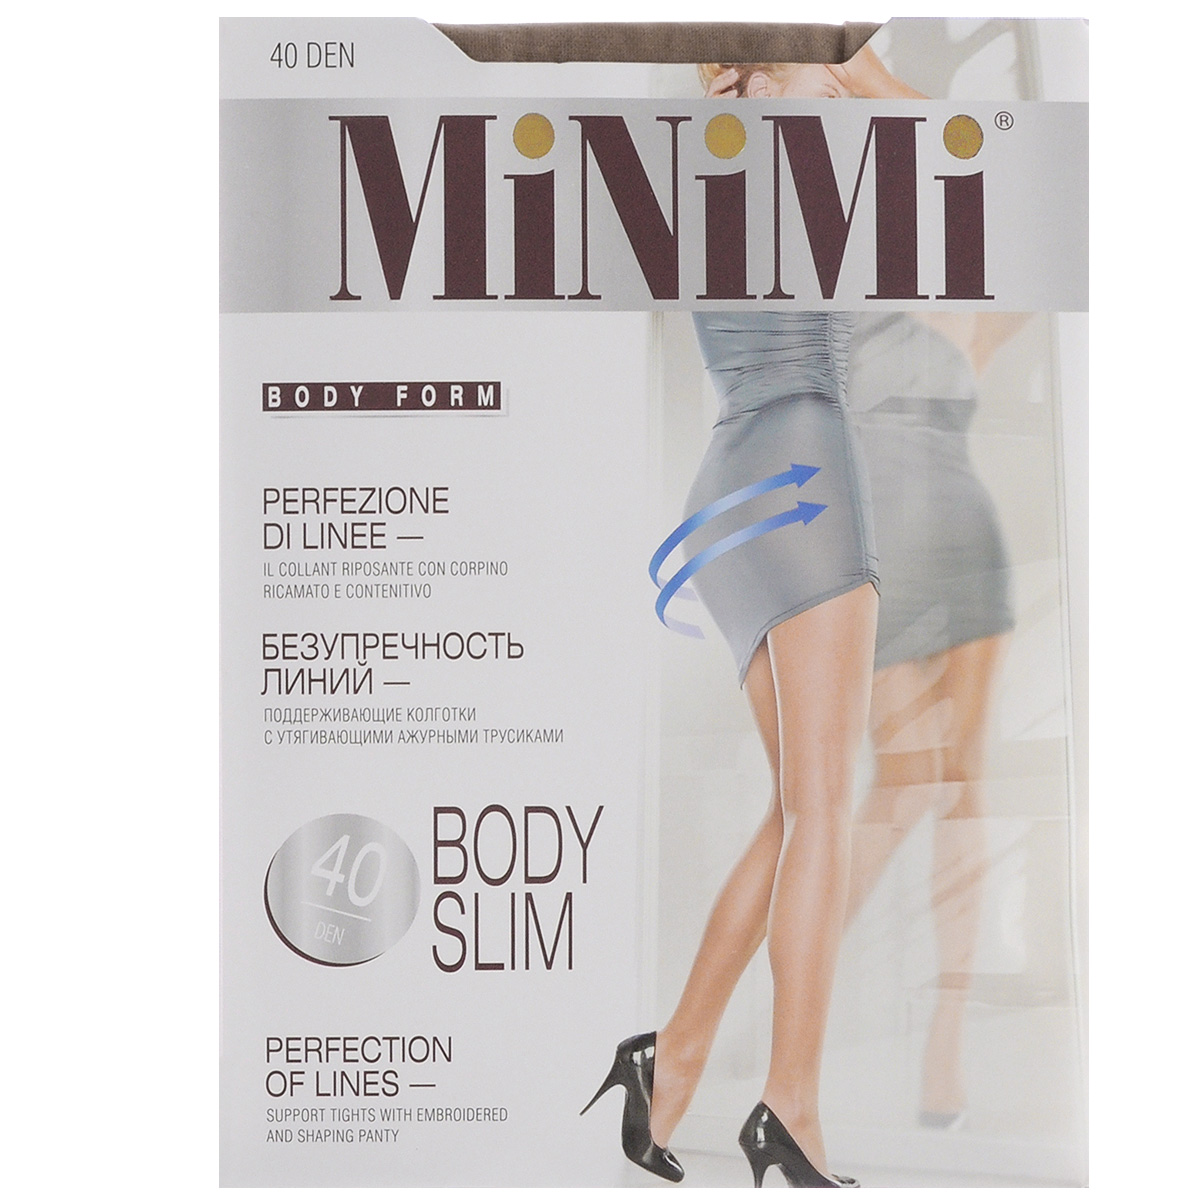 Колготки женские Minimi Body Slim 40, цвет: Daino (загар). Размер 3 (M) колготки giulia bikini размер 3 плотность 40 den daino